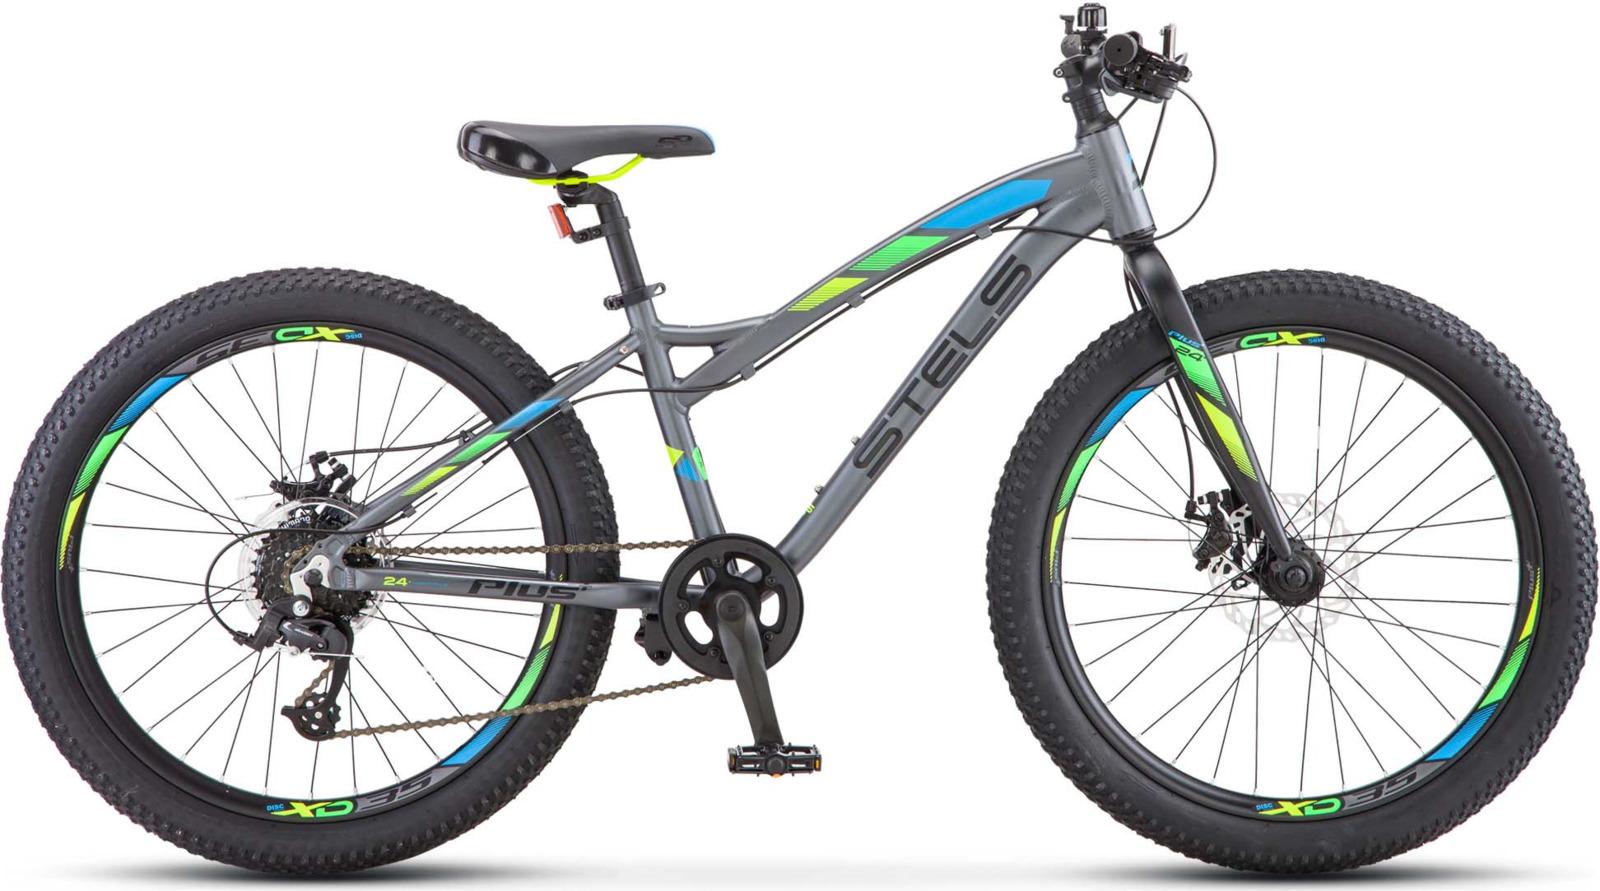 цена на Велосипед Stels Adrenalin MD 13,5, KUBC0049072018, серый